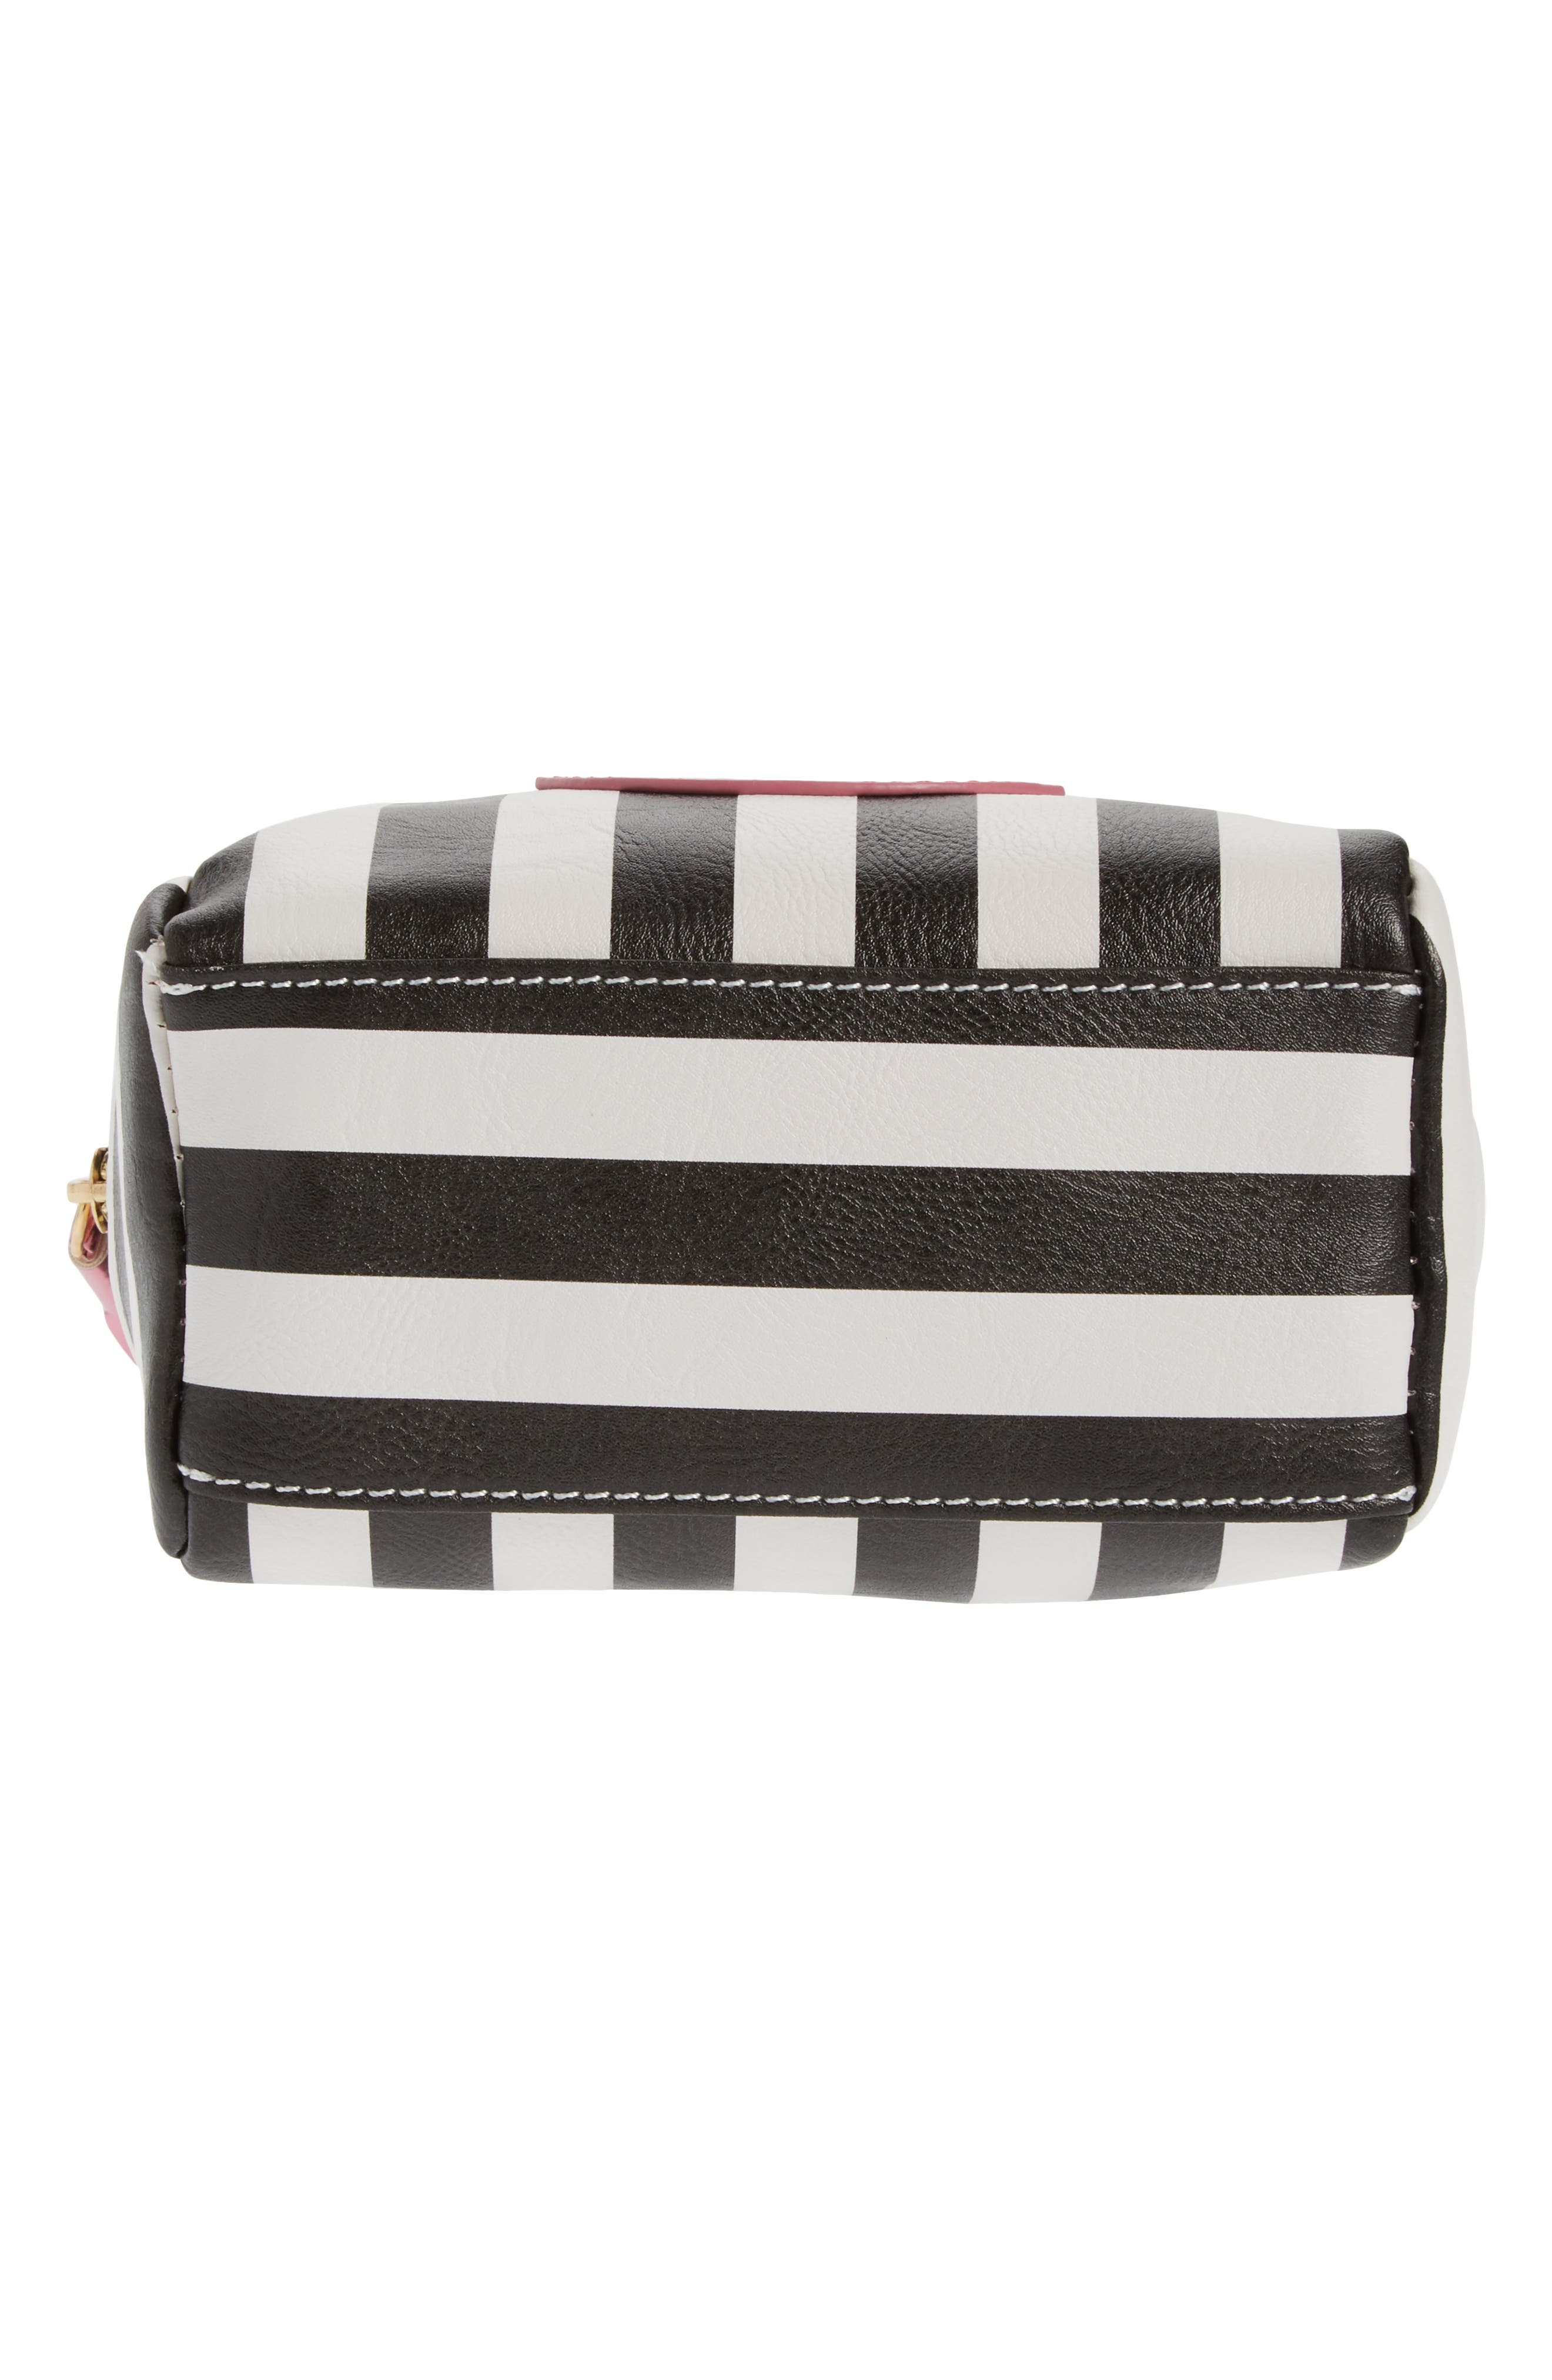 Metallic Lip Stripe Cosmetics Bag,                             Alternate thumbnail 5, color,                             Black/ White